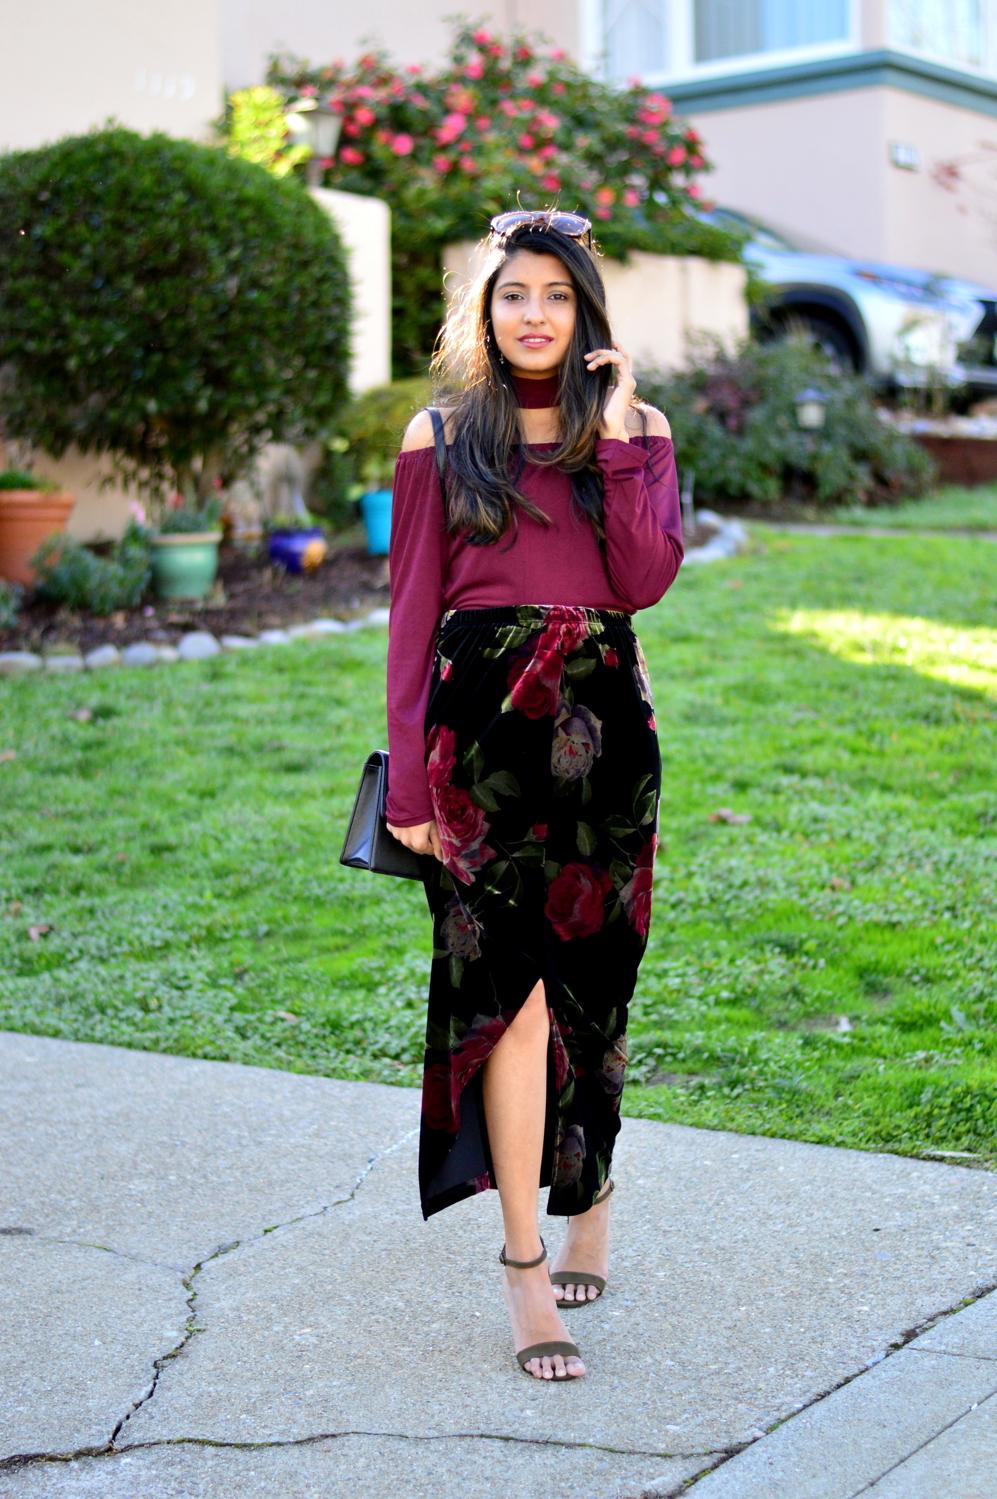 velvet-floral-skirt-choker-burgundy-top-party-outfit-NYE-blogger 7